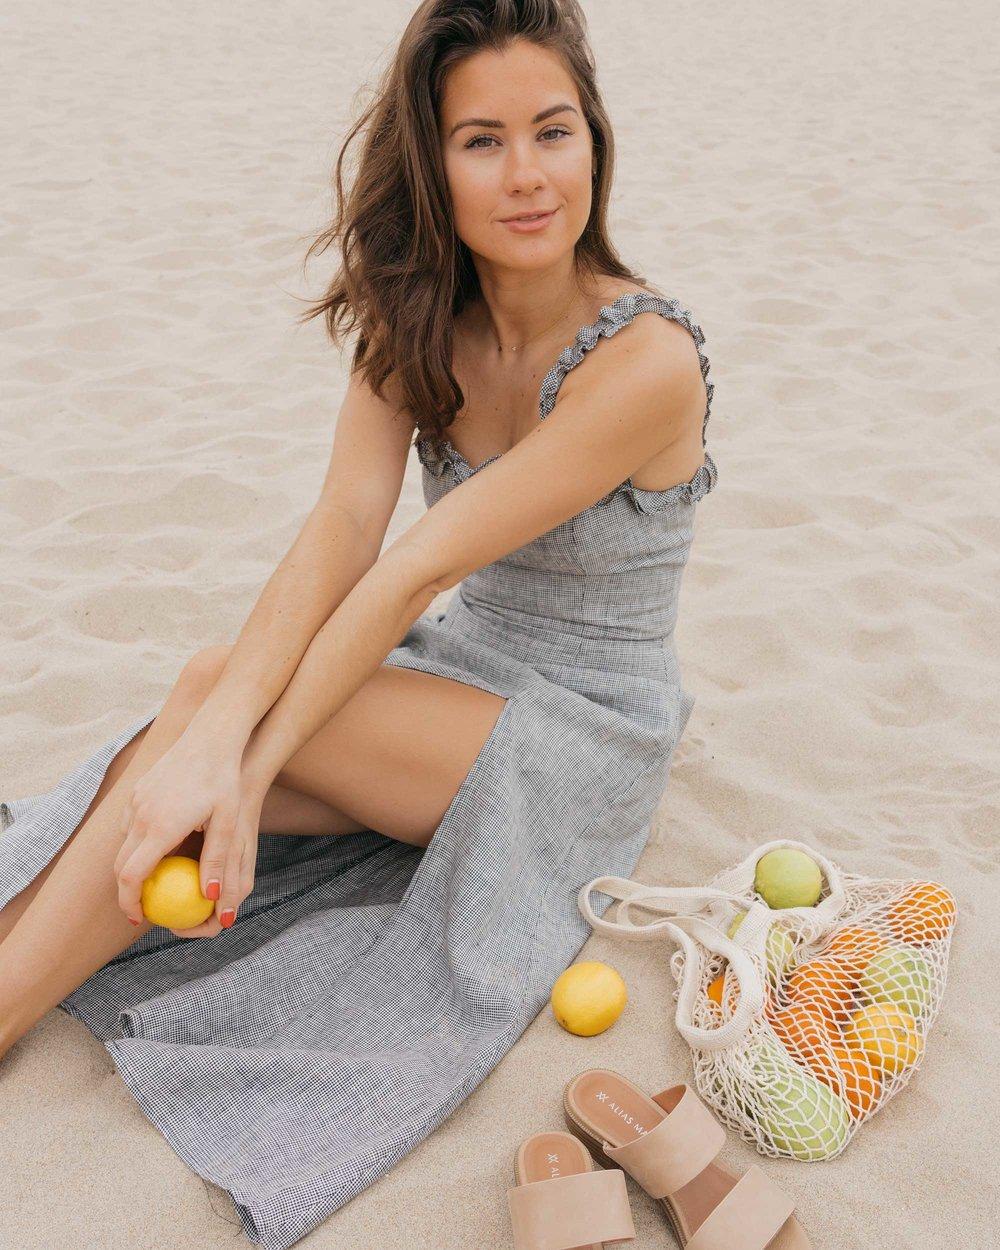 Reformation Lavendar Midi Dress Cotton Net Shopping Tote Newport Beach California Summer Outfit1.jpg